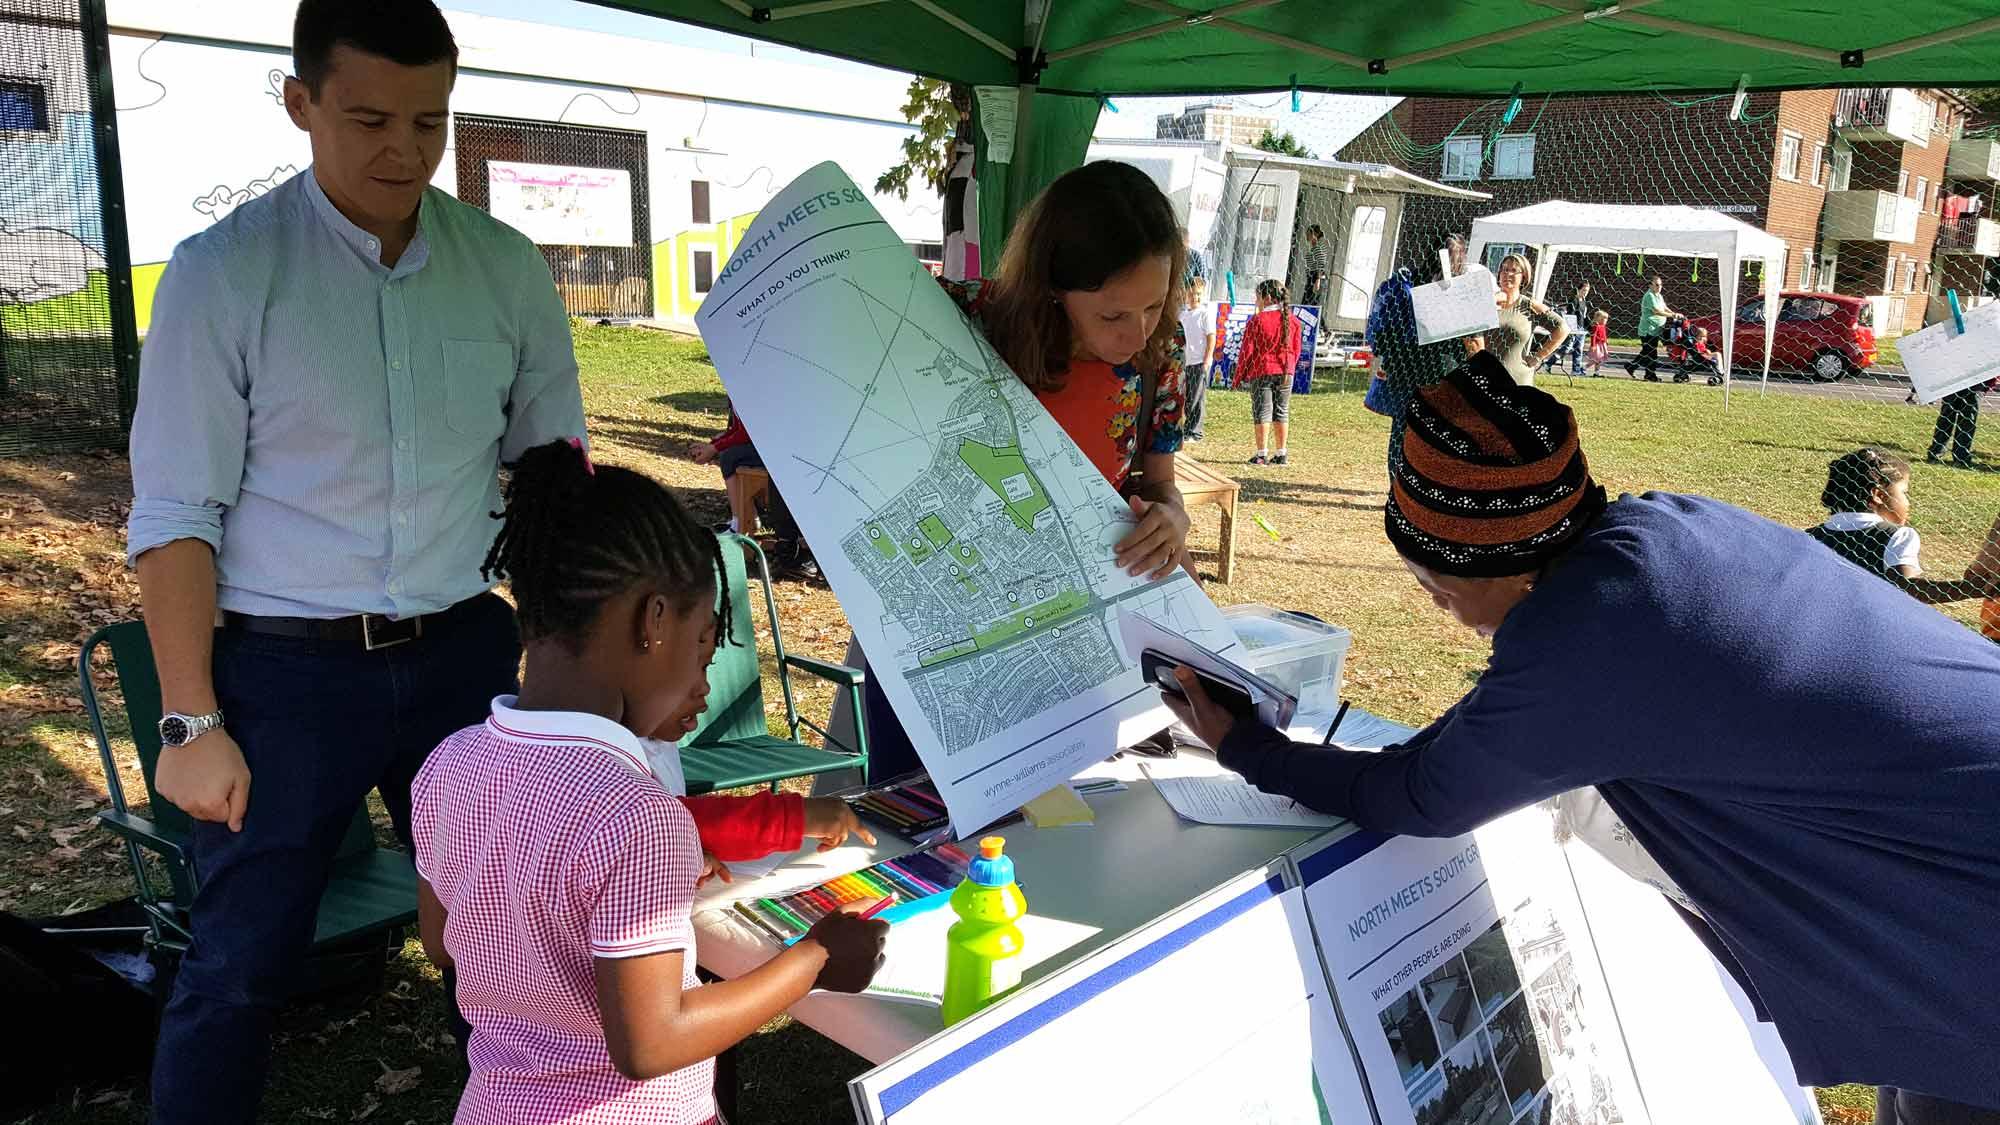 Public Consultation for Big Local scheme